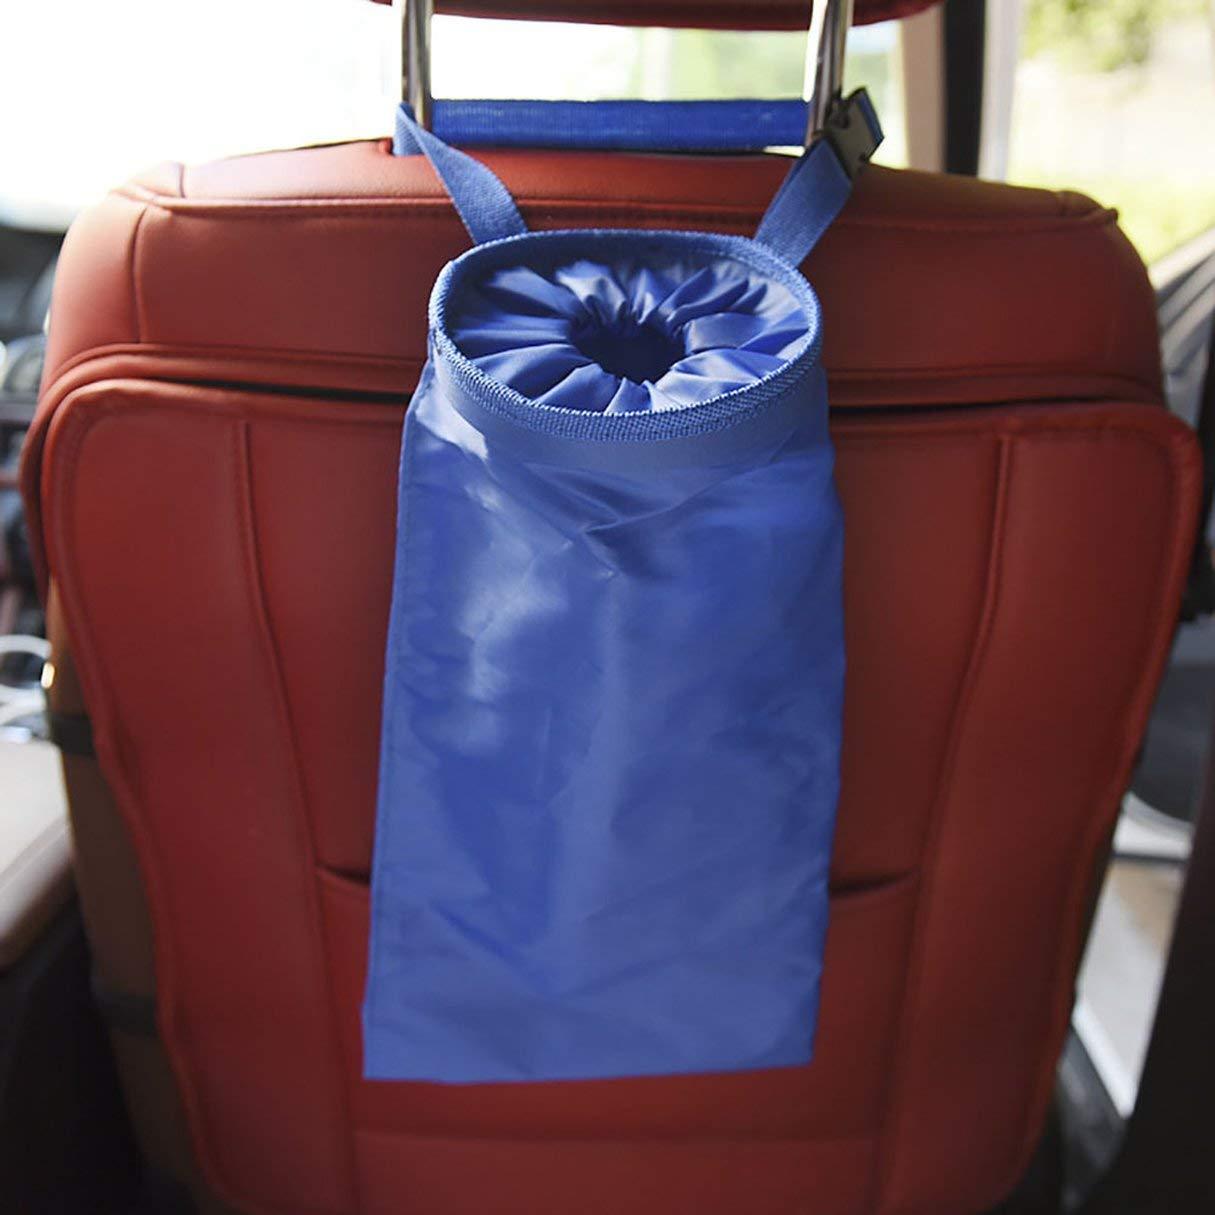 Foldable Car Trash Bin Frame Auto Garbage Bin Auto Rubbish Storage Waste Organizer Holder Bag Bucket